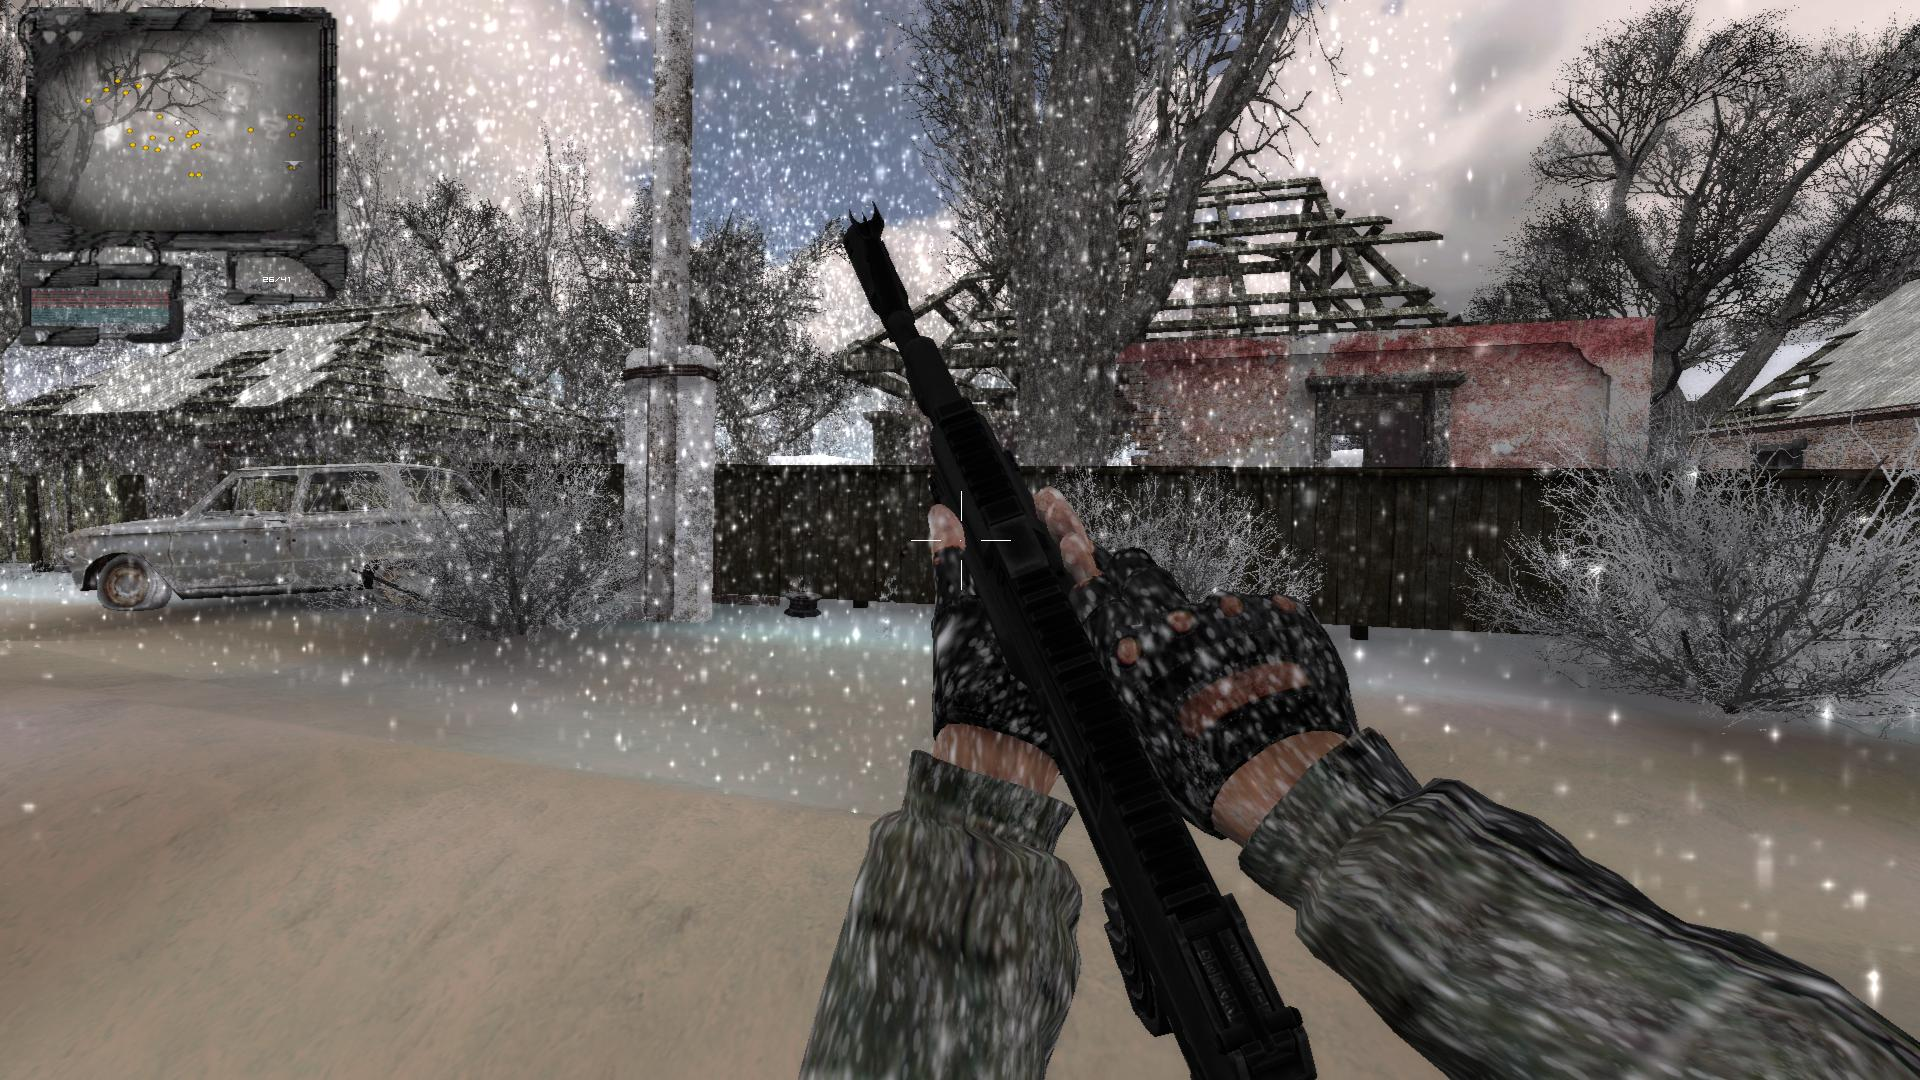 Ak12 image - S.T.A.L.K.E.R. - The Cursed Zone mod for S.T